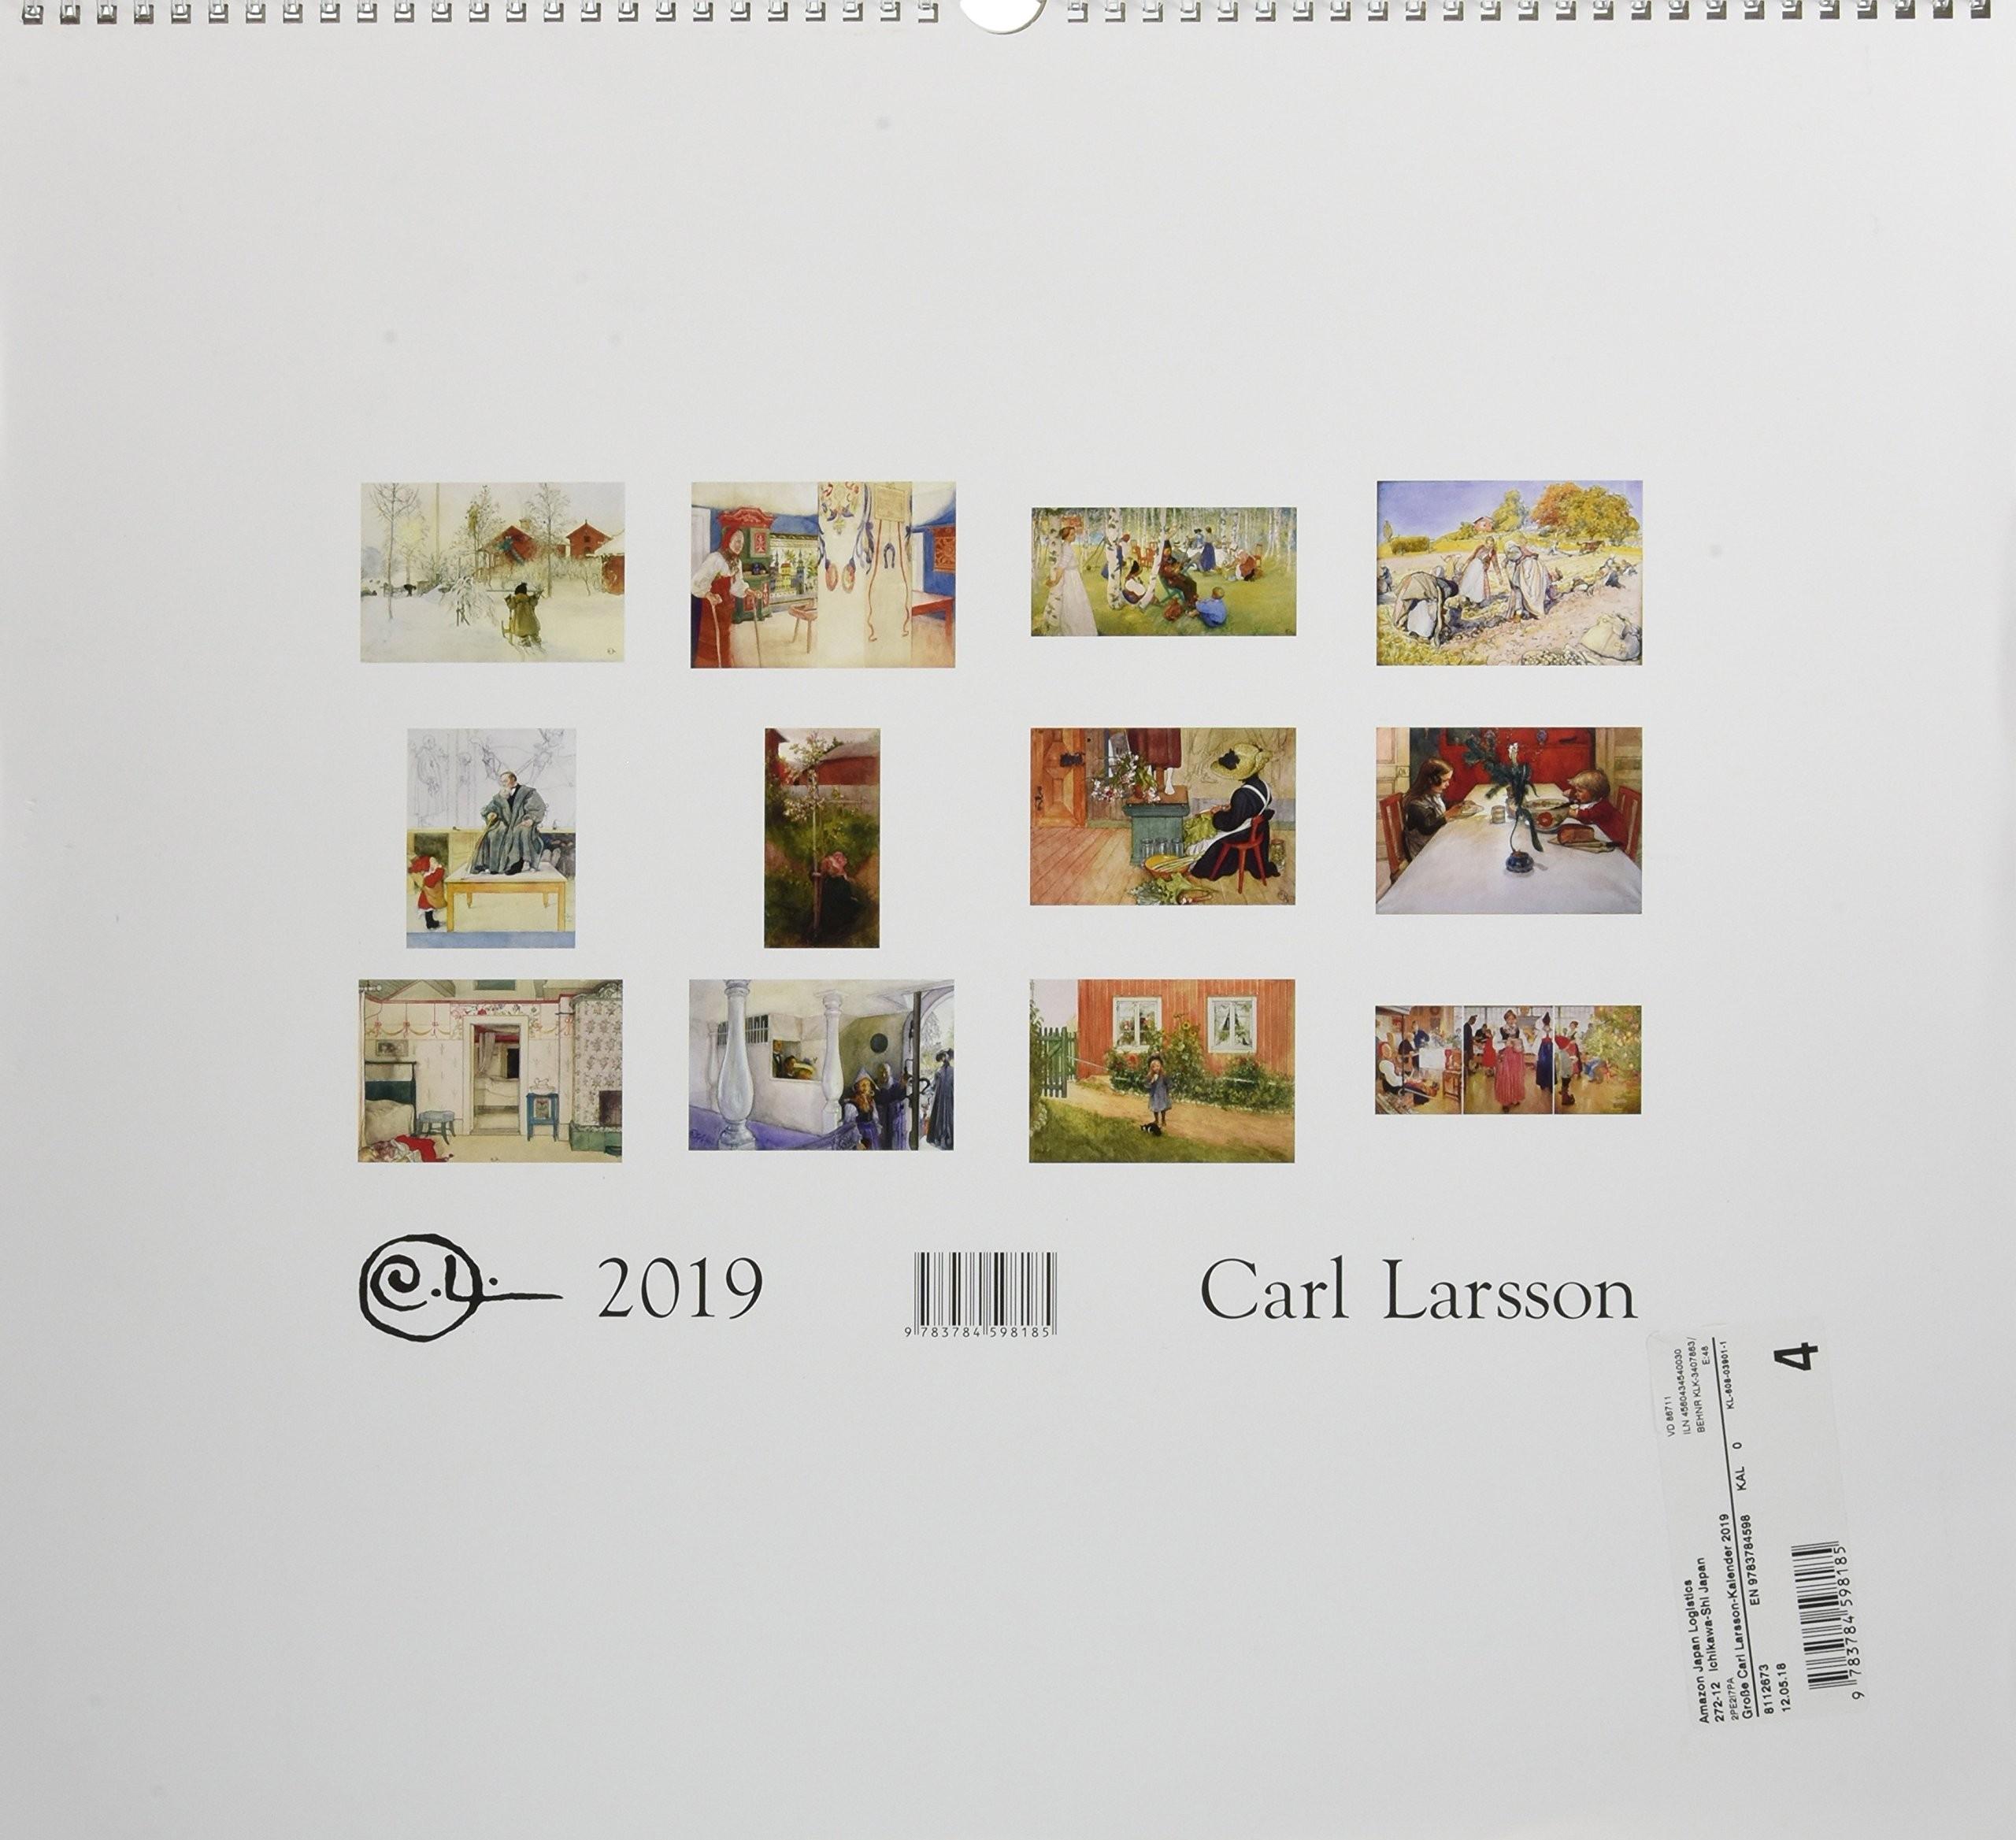 Der Große Carl Larsson Kalender 2019 Amazon Carl Larsson Libri in altre lingue